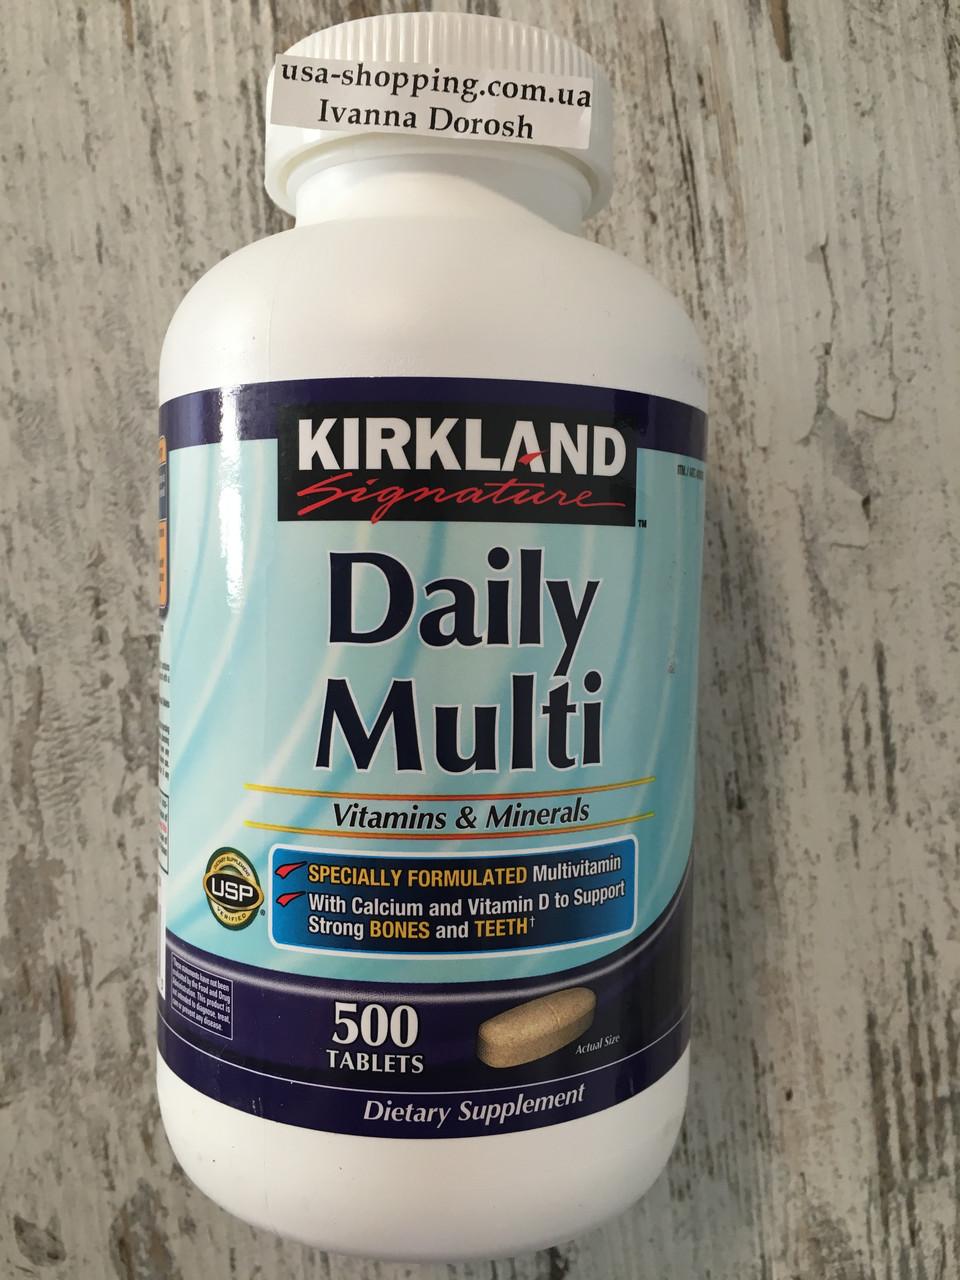 Витамины и менералы Kirkland Signature Daily Multi, 500 штук